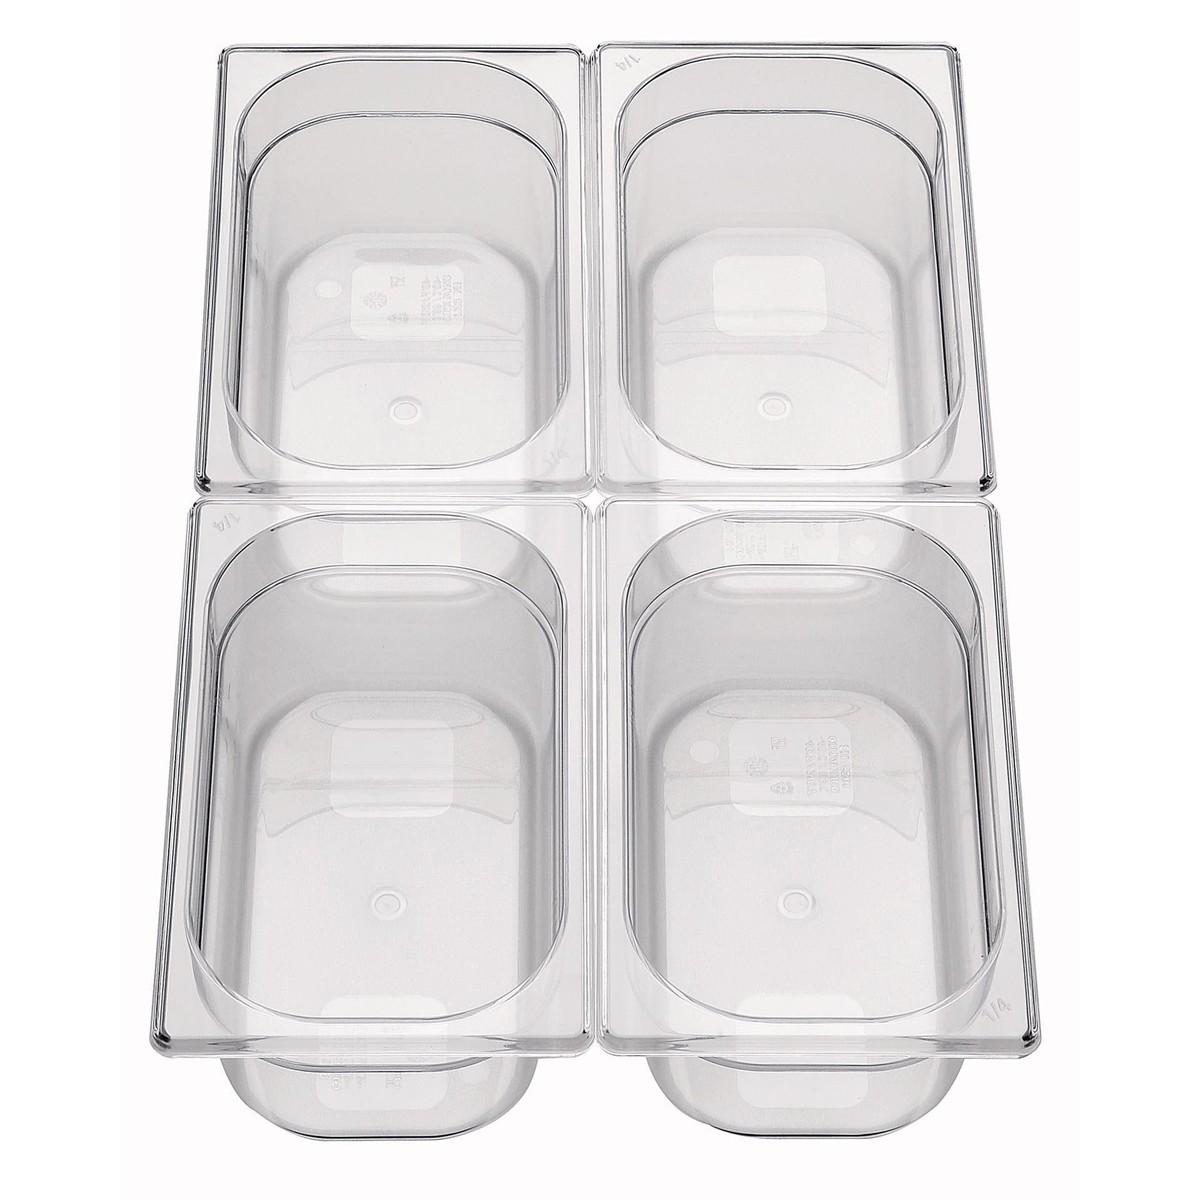 GN-Behälter 1/4 Polycarbonat 150mm